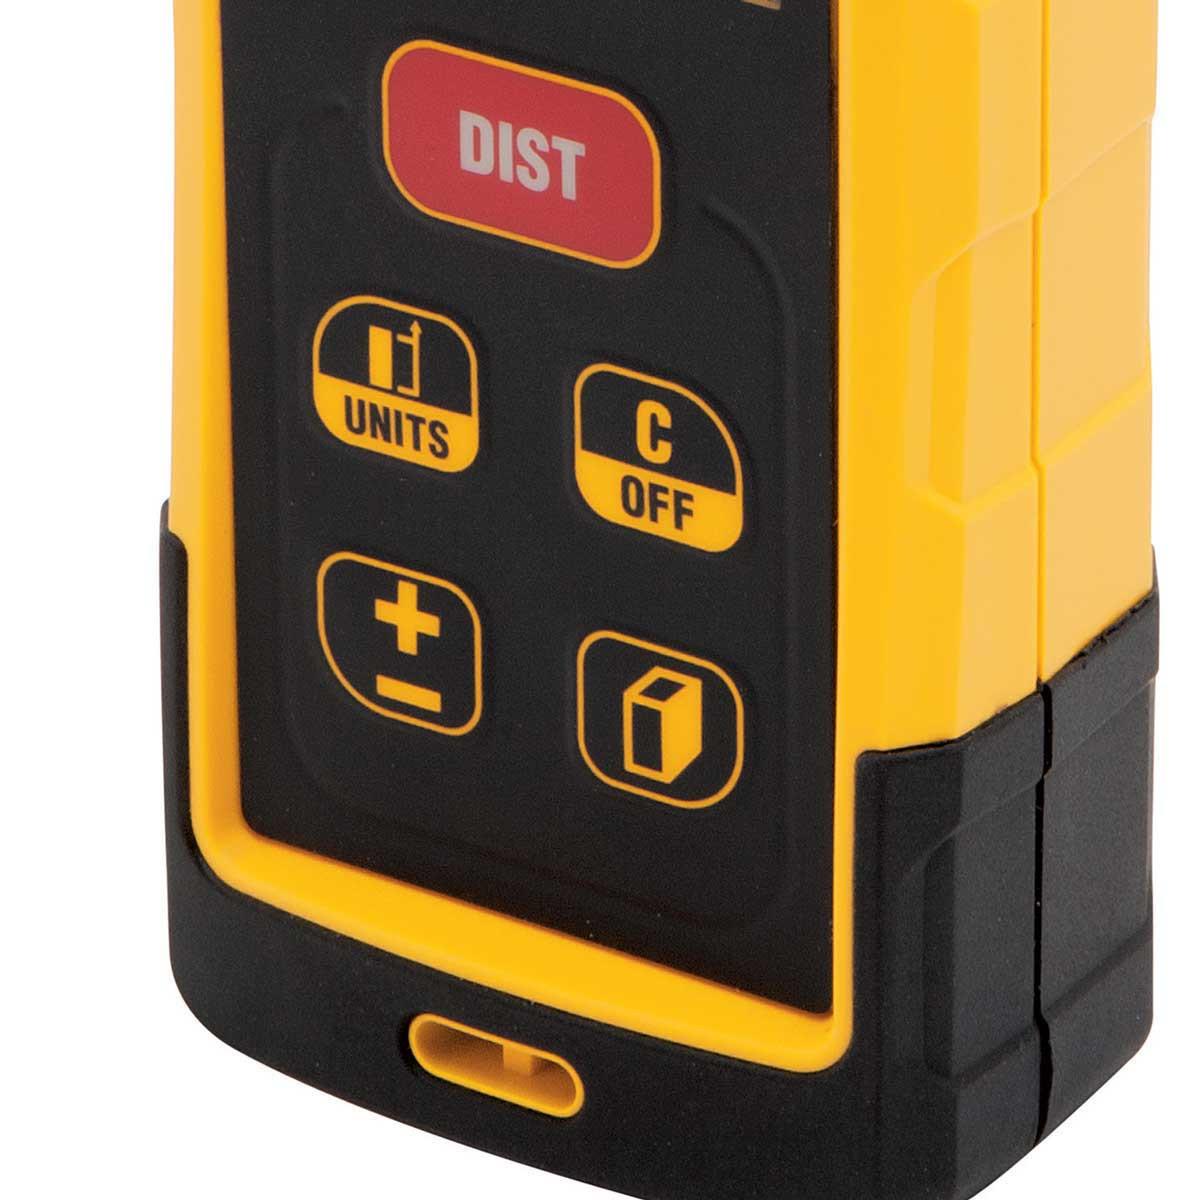 DW03050 DeWalt Laser Distance Measure